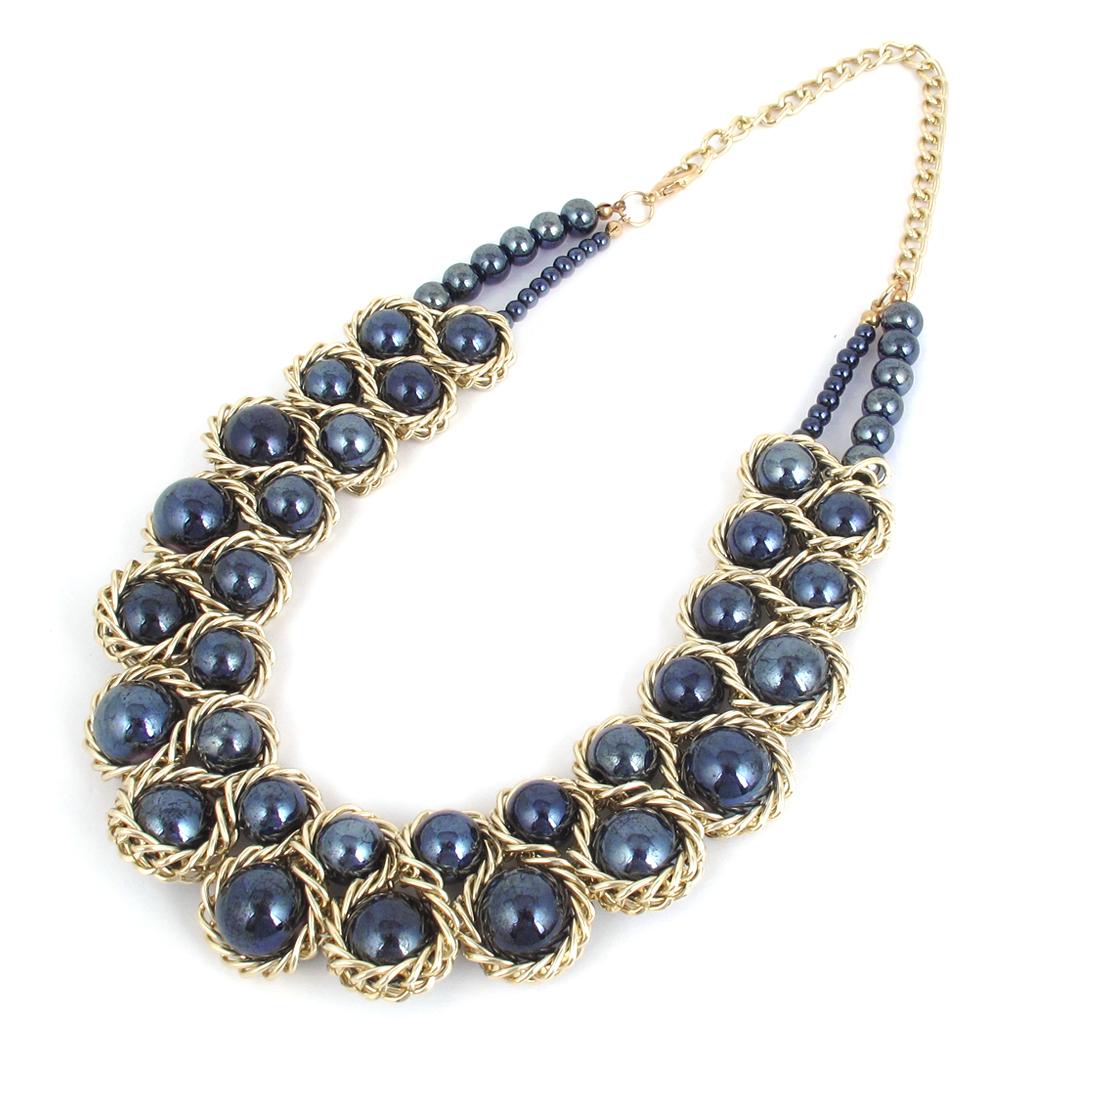 Lady Blue Beads Pendant Bib Choker Statement Collar Chain Necklace Gold Tone